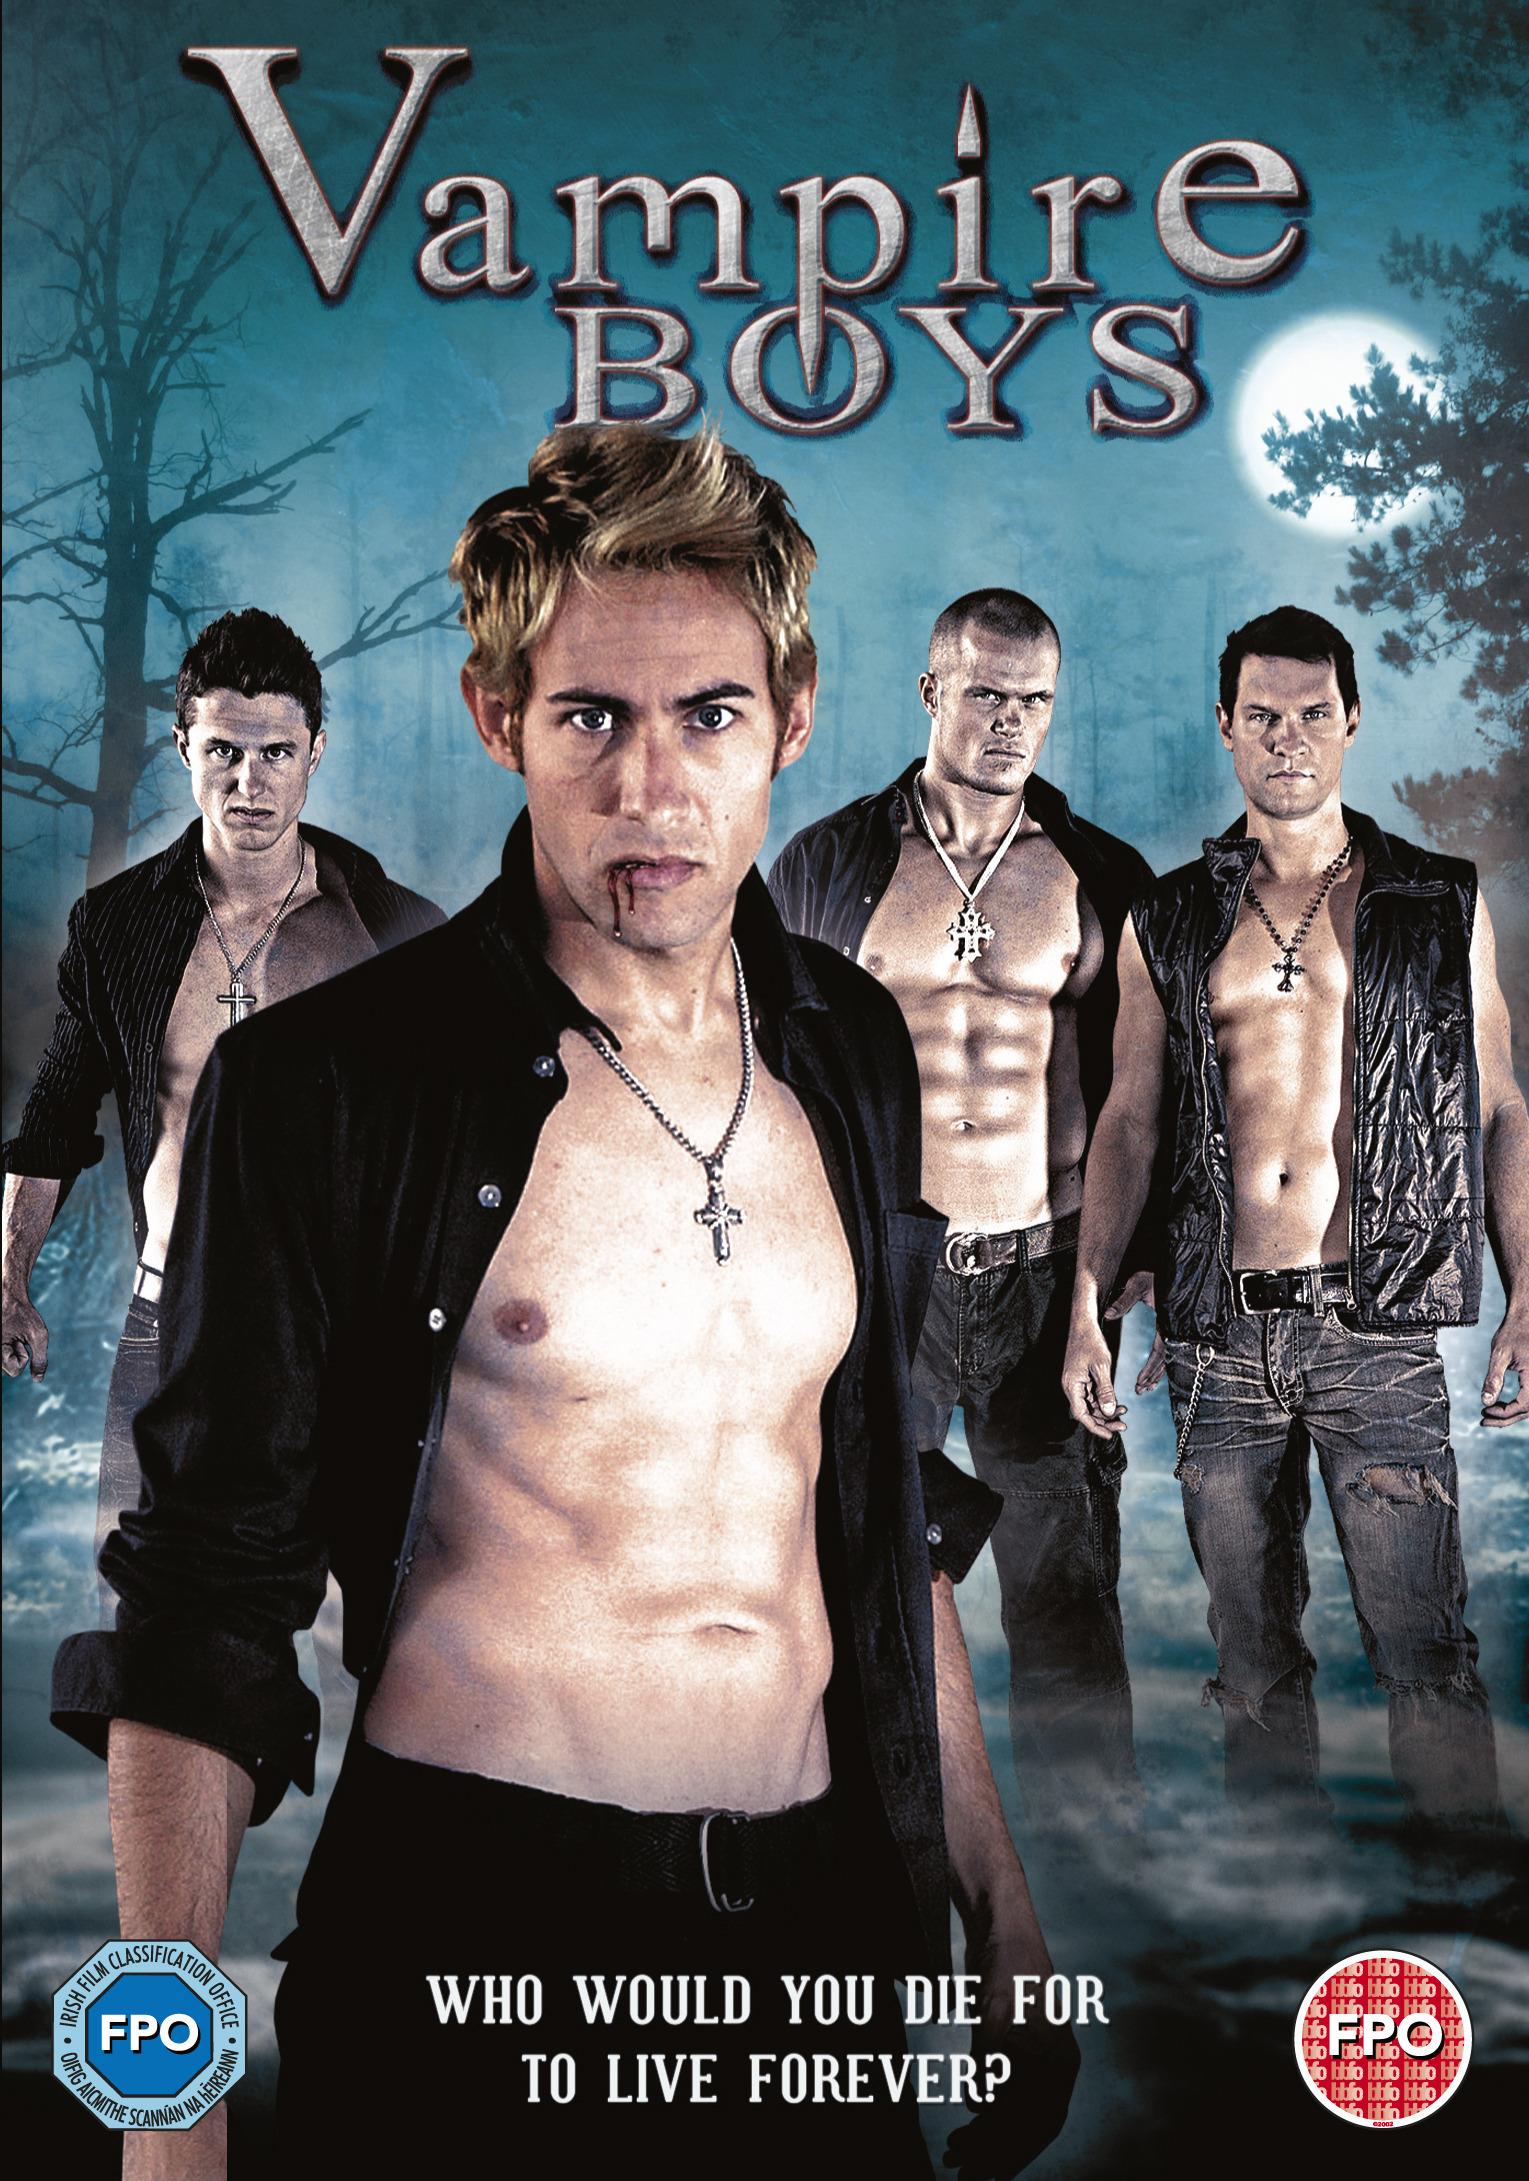 Смотреть онлайн vampyre lovers 2010 dvdrip 23 фотография